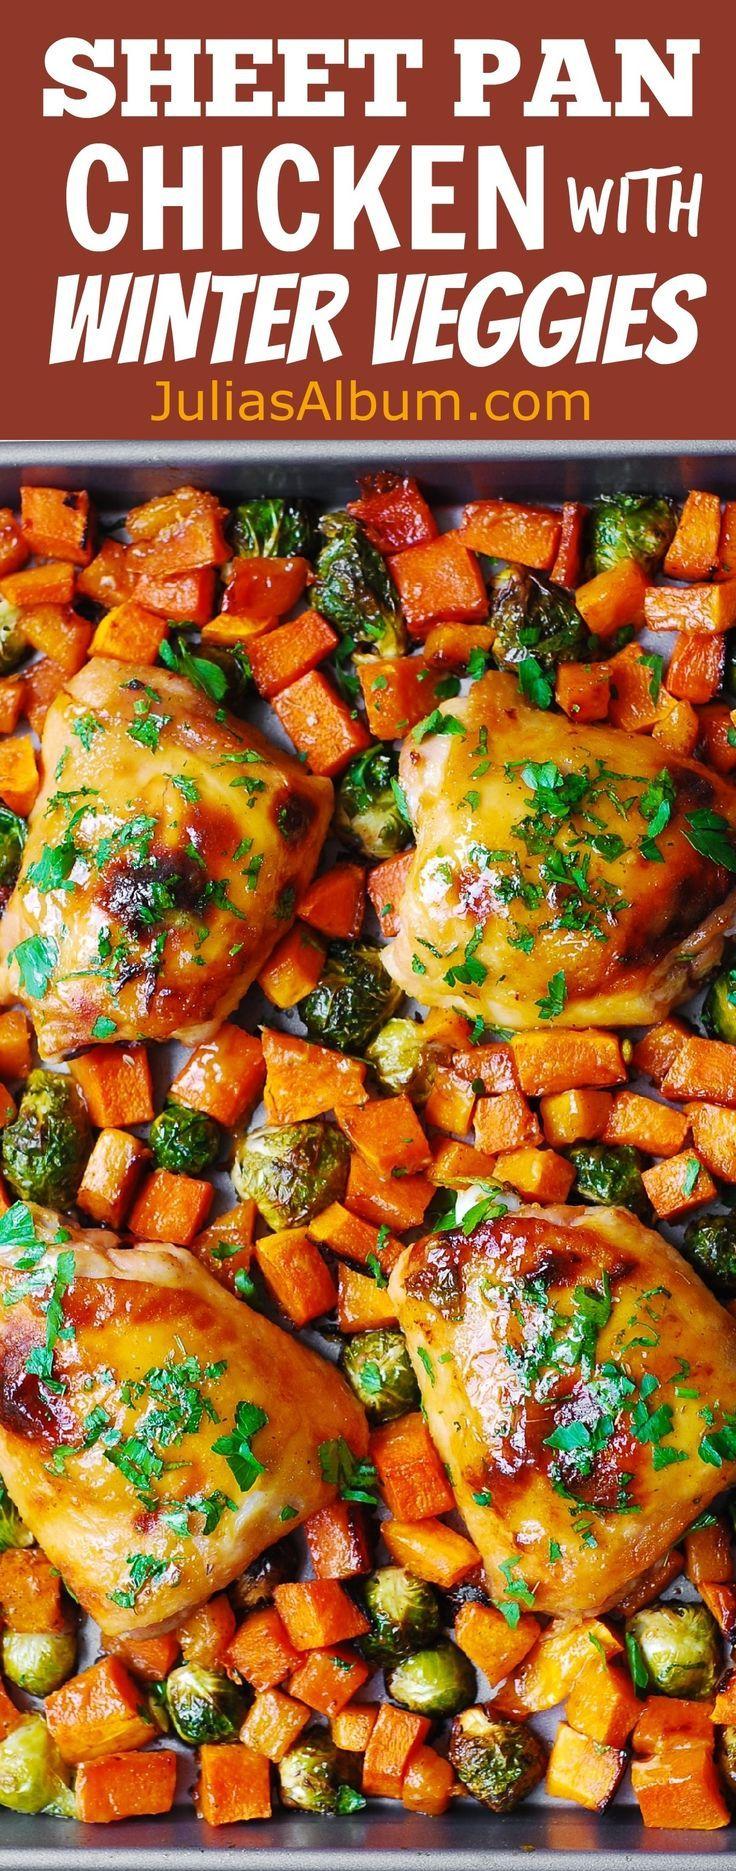 Thanksgiving Sheet Pan Chicken Dinner with Winter veggies: Maple-Dijon Chicken Thighs with Roasted Butternut Squash and Brussels Sprouts.  #Autumn #Fall #dinner #onepandinnerschicken